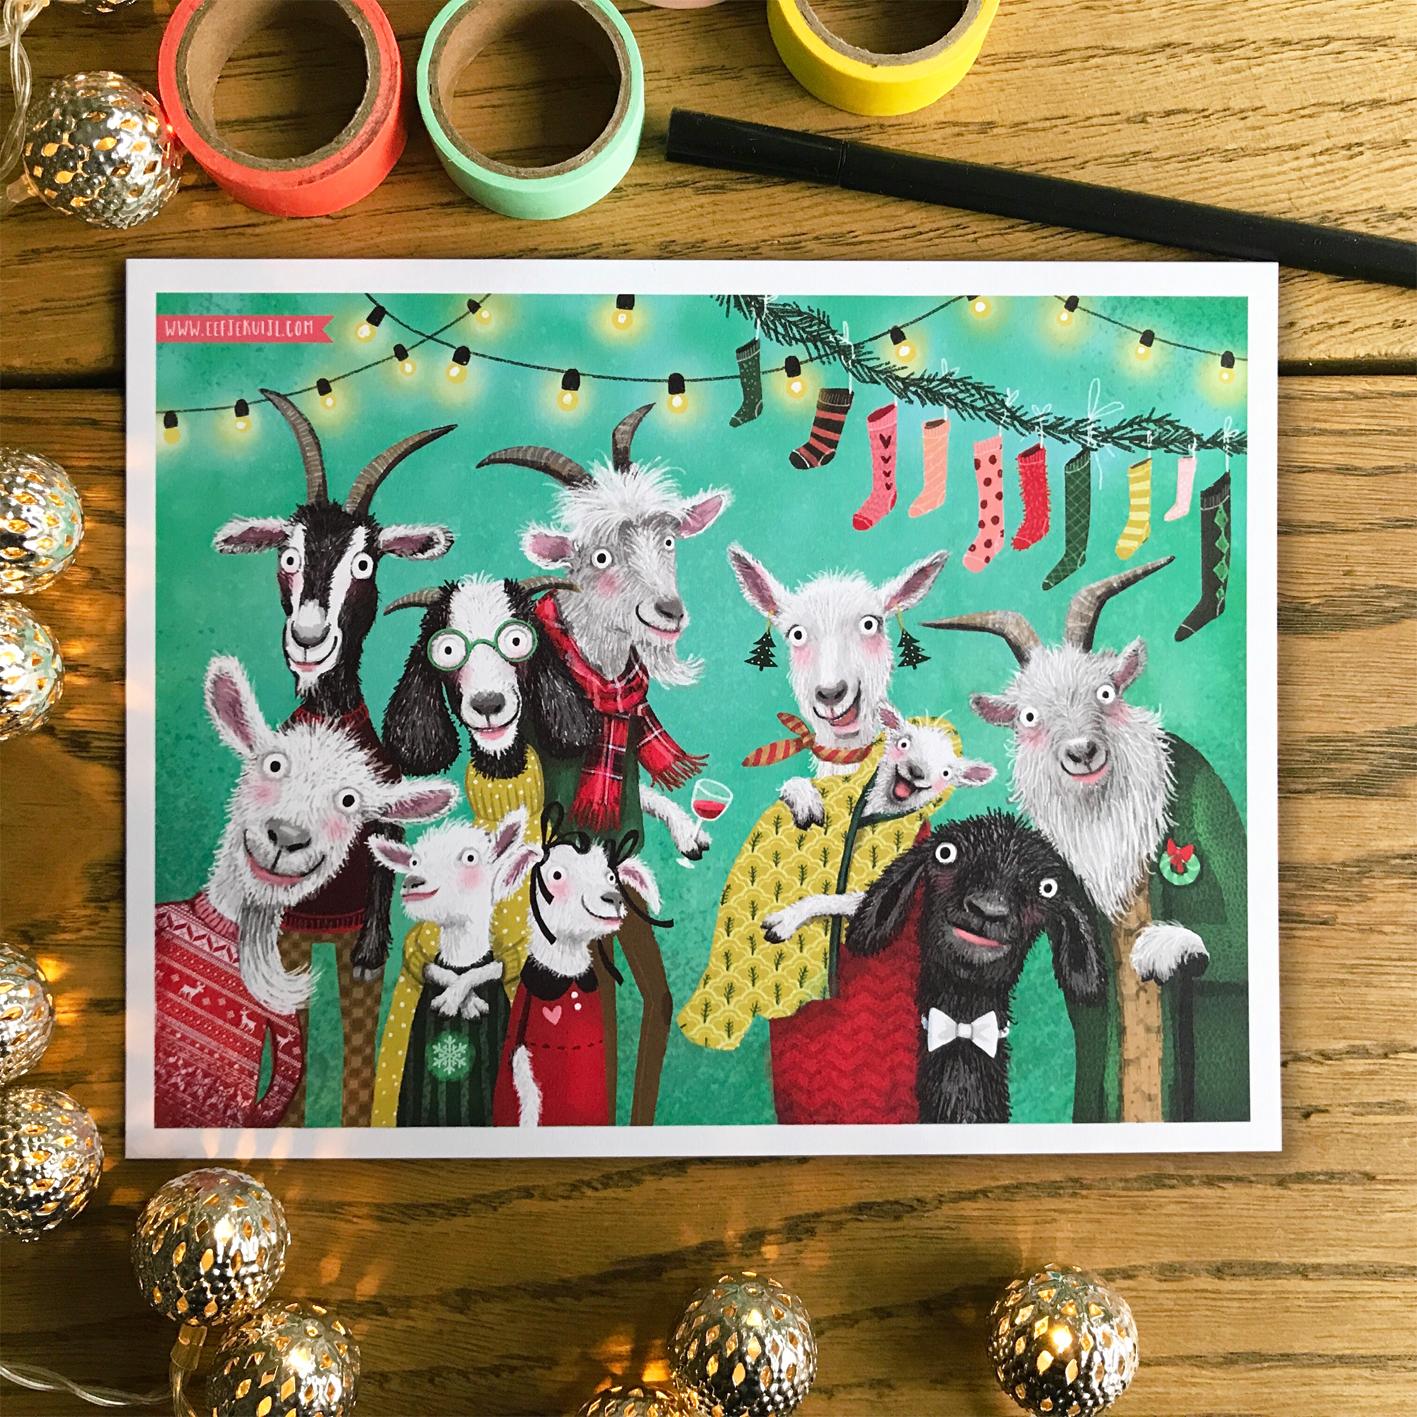 Christmas_card_Eefje_Kuijl_2018_2019.jpg